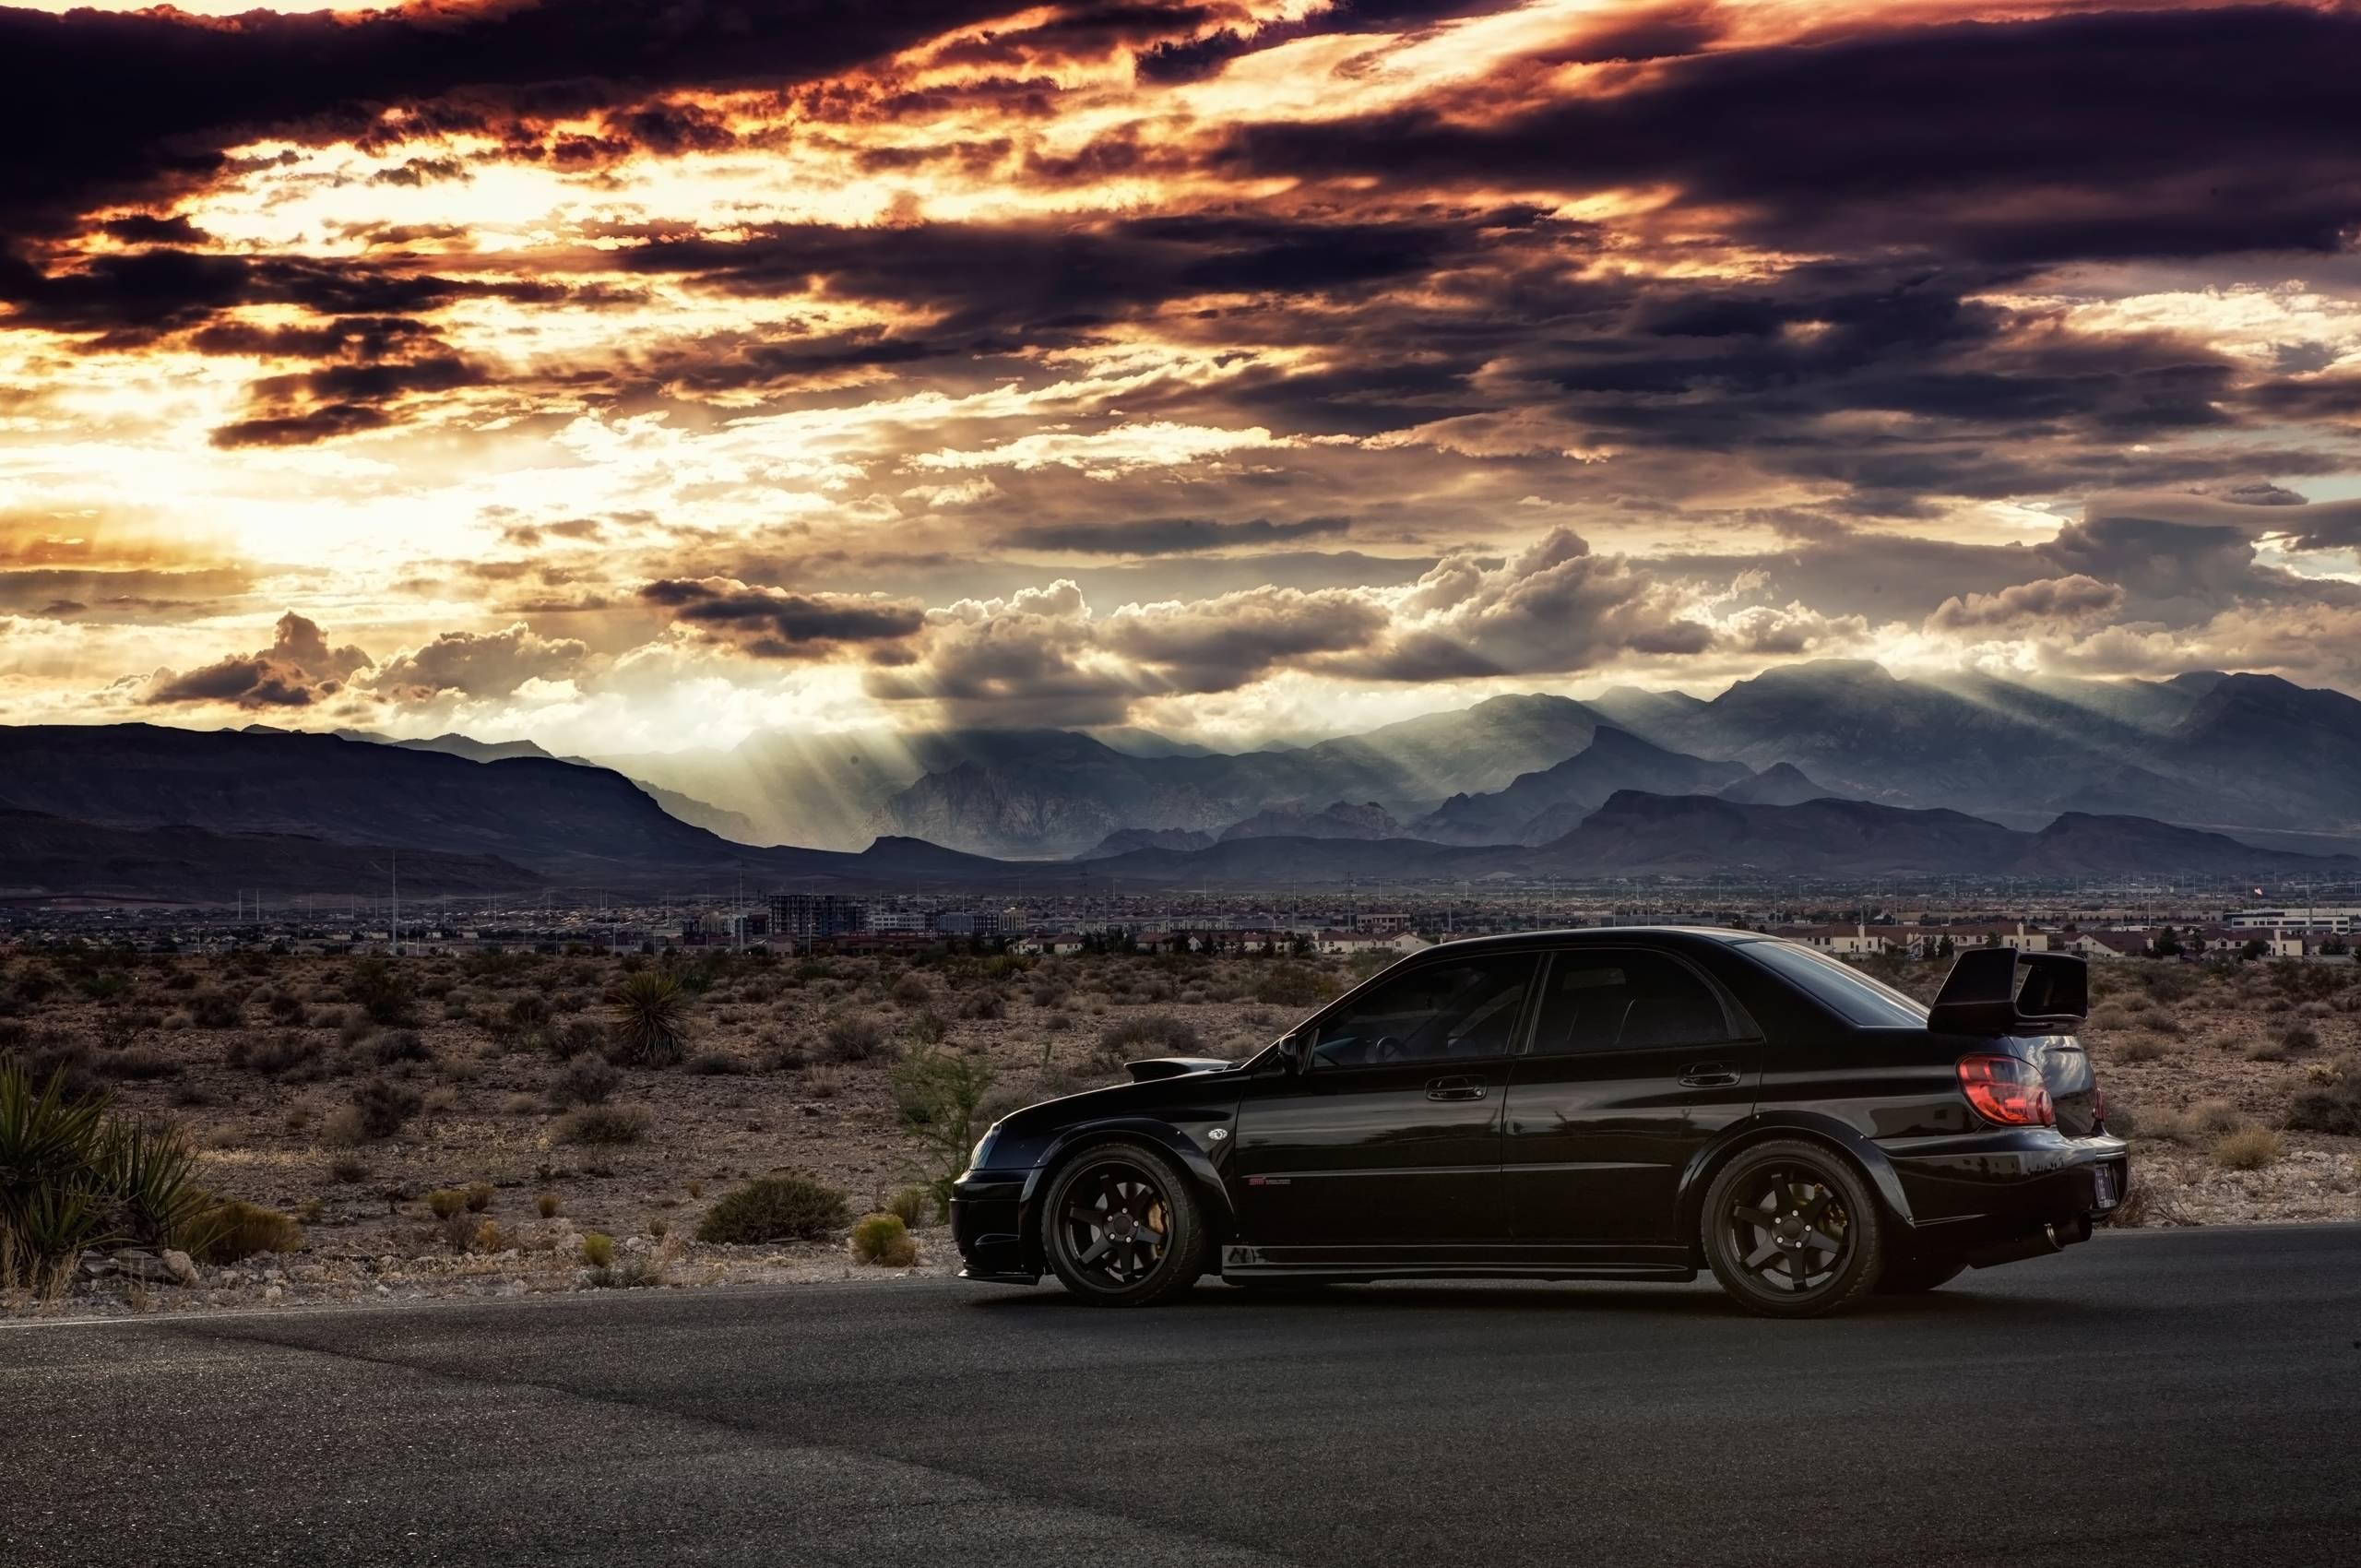 Subaru Wallpapers Top Free Subaru Backgrounds